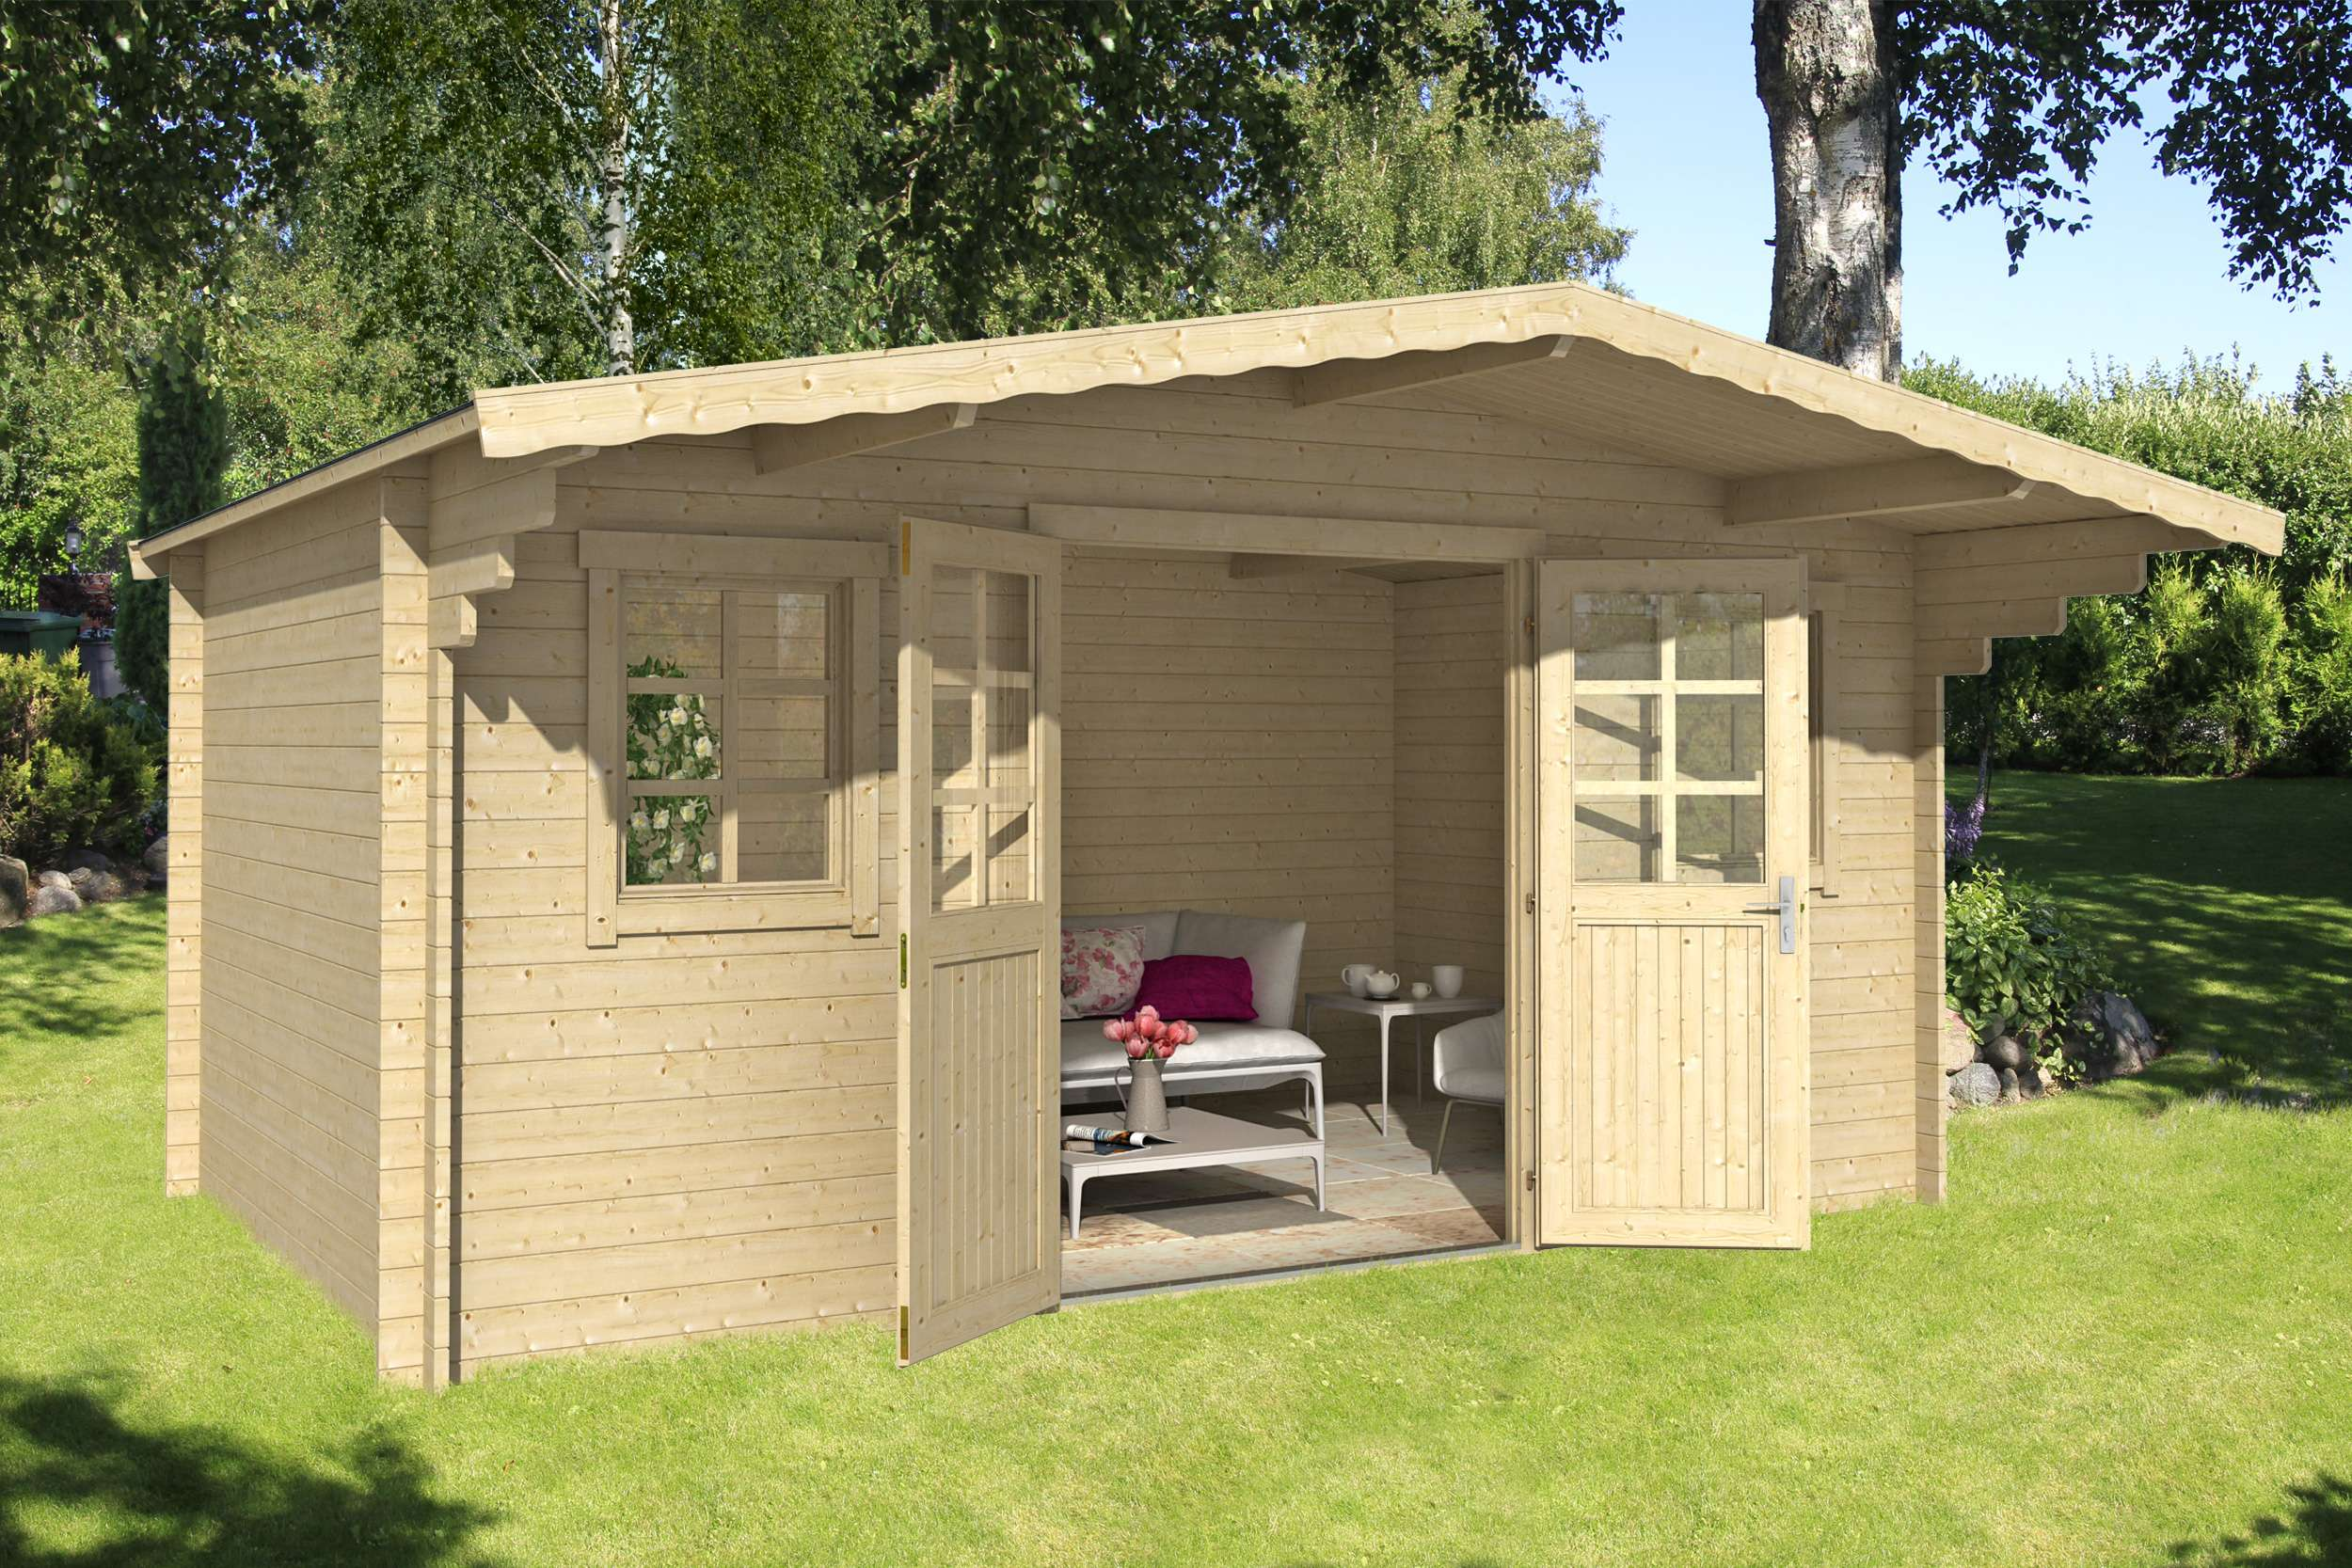 gartenhaus ausstellung hahn am see my blog. Black Bedroom Furniture Sets. Home Design Ideas